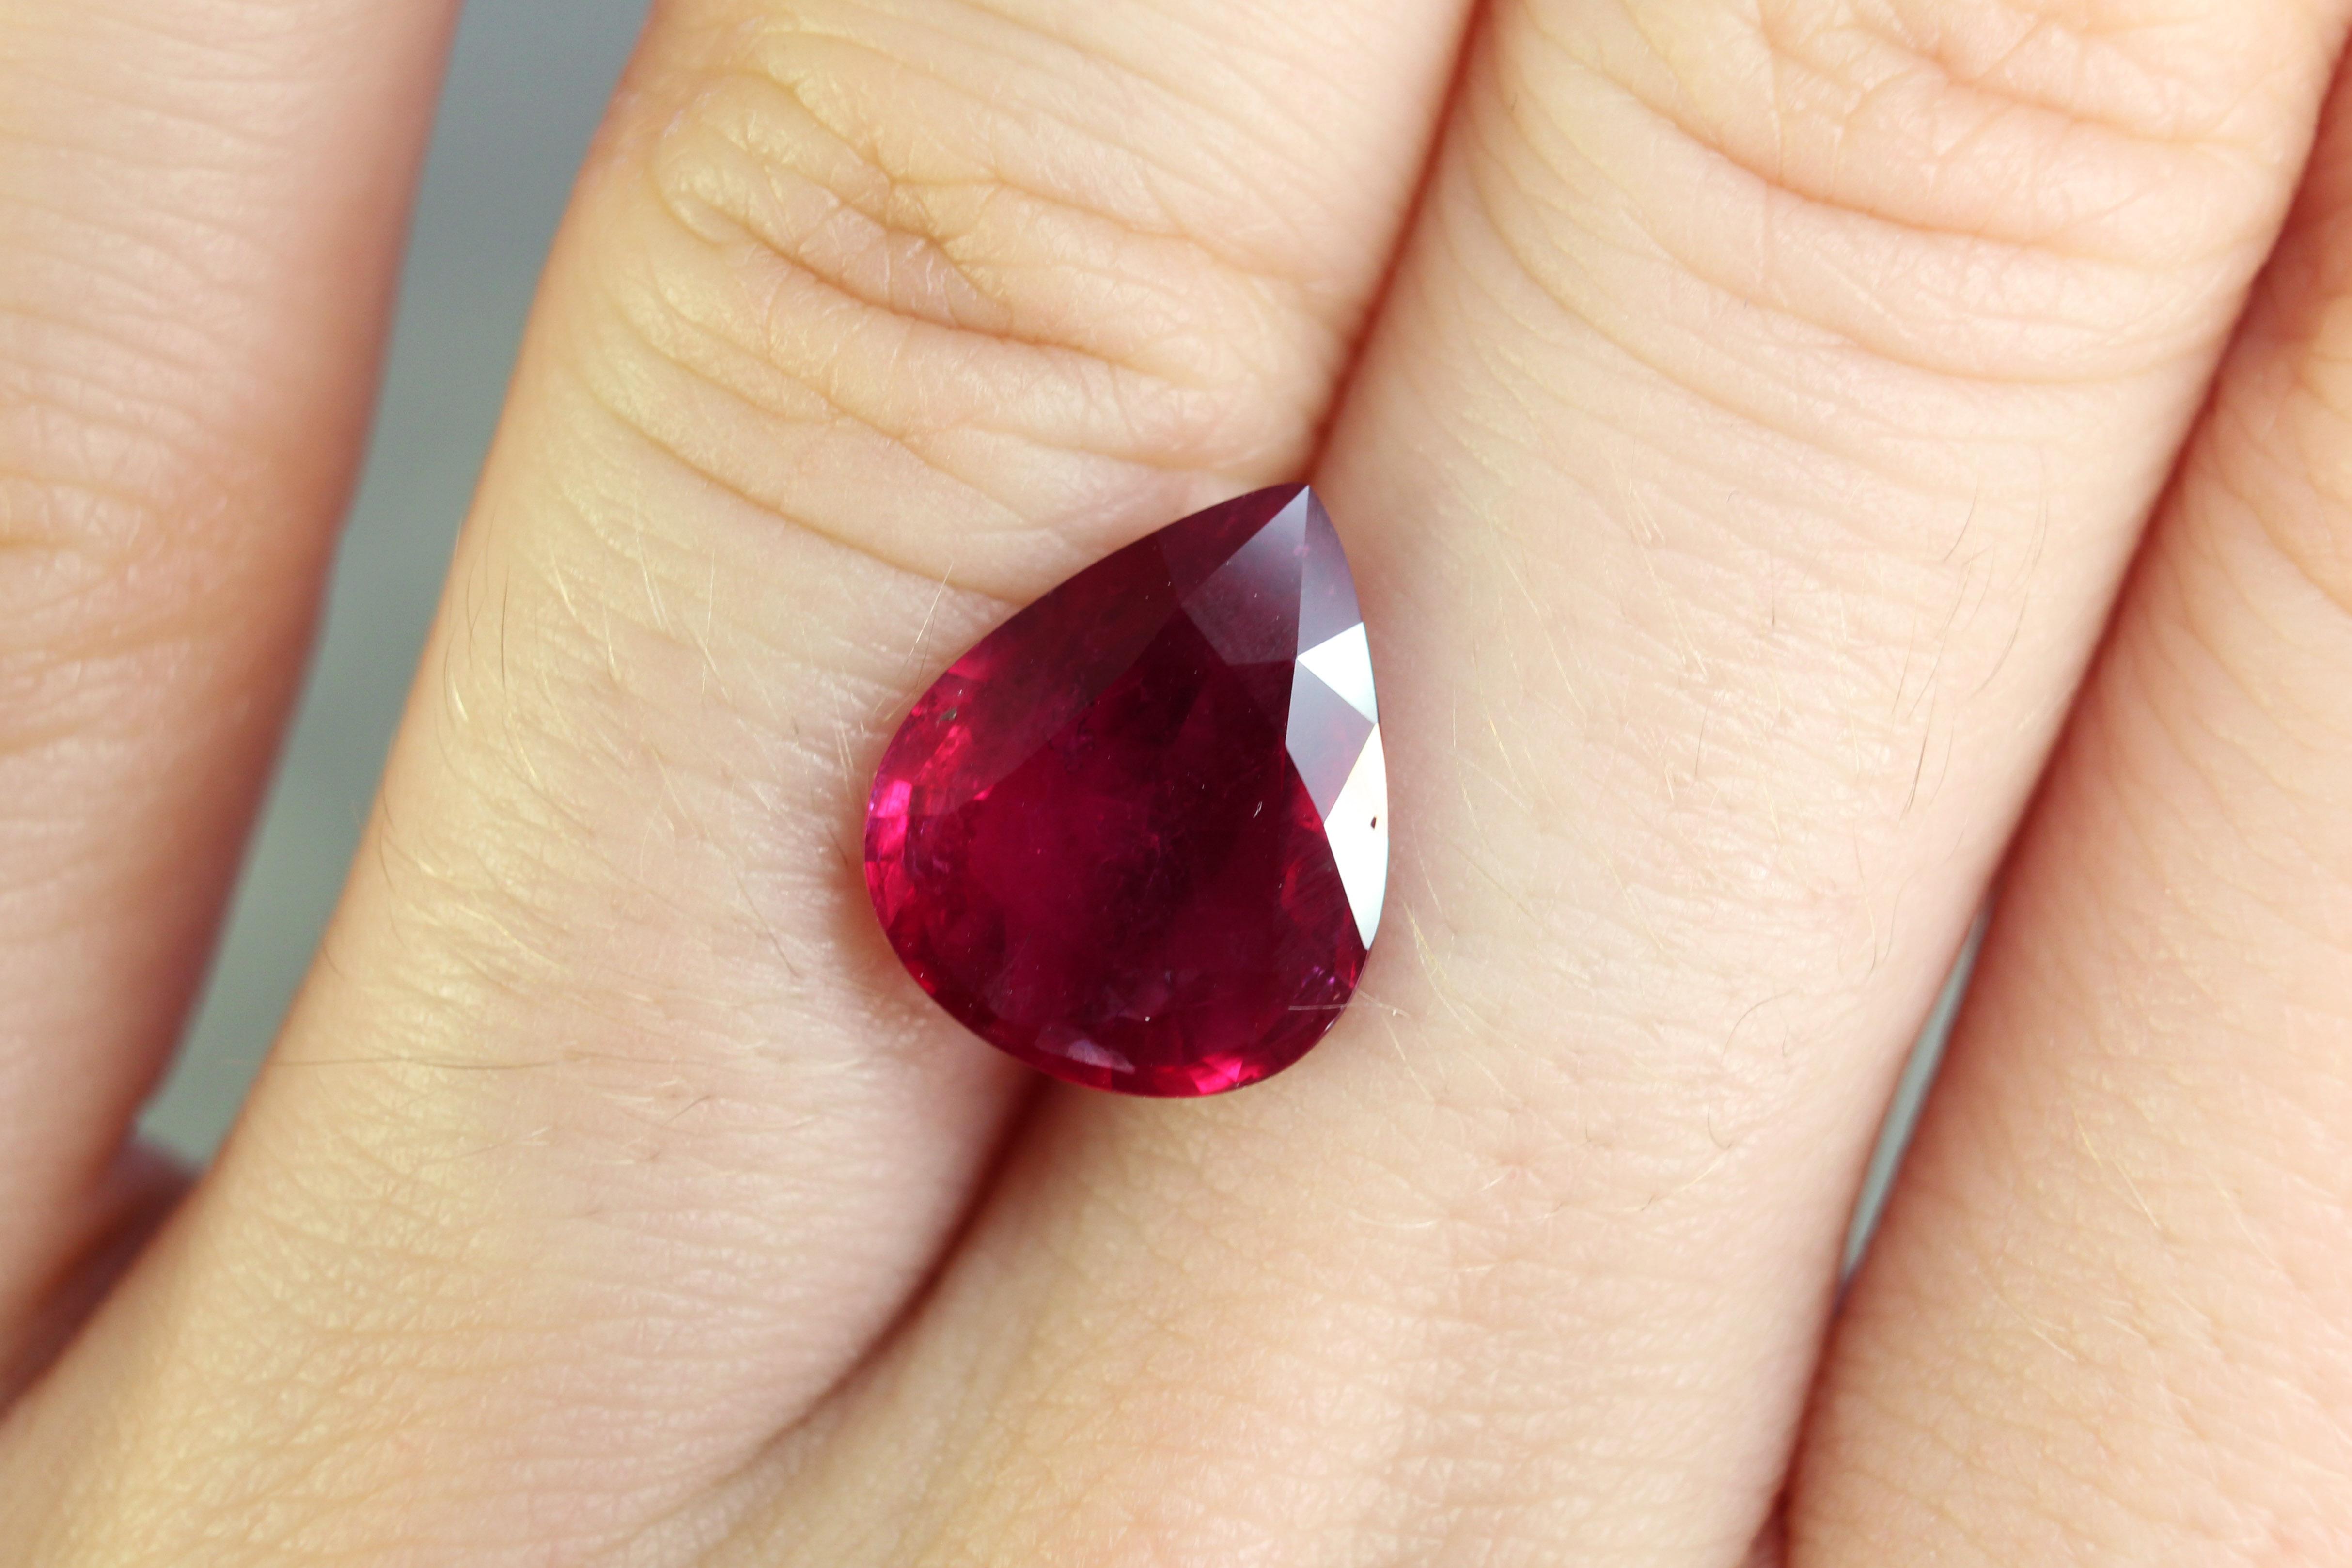 4.07 ct pear shape ruby